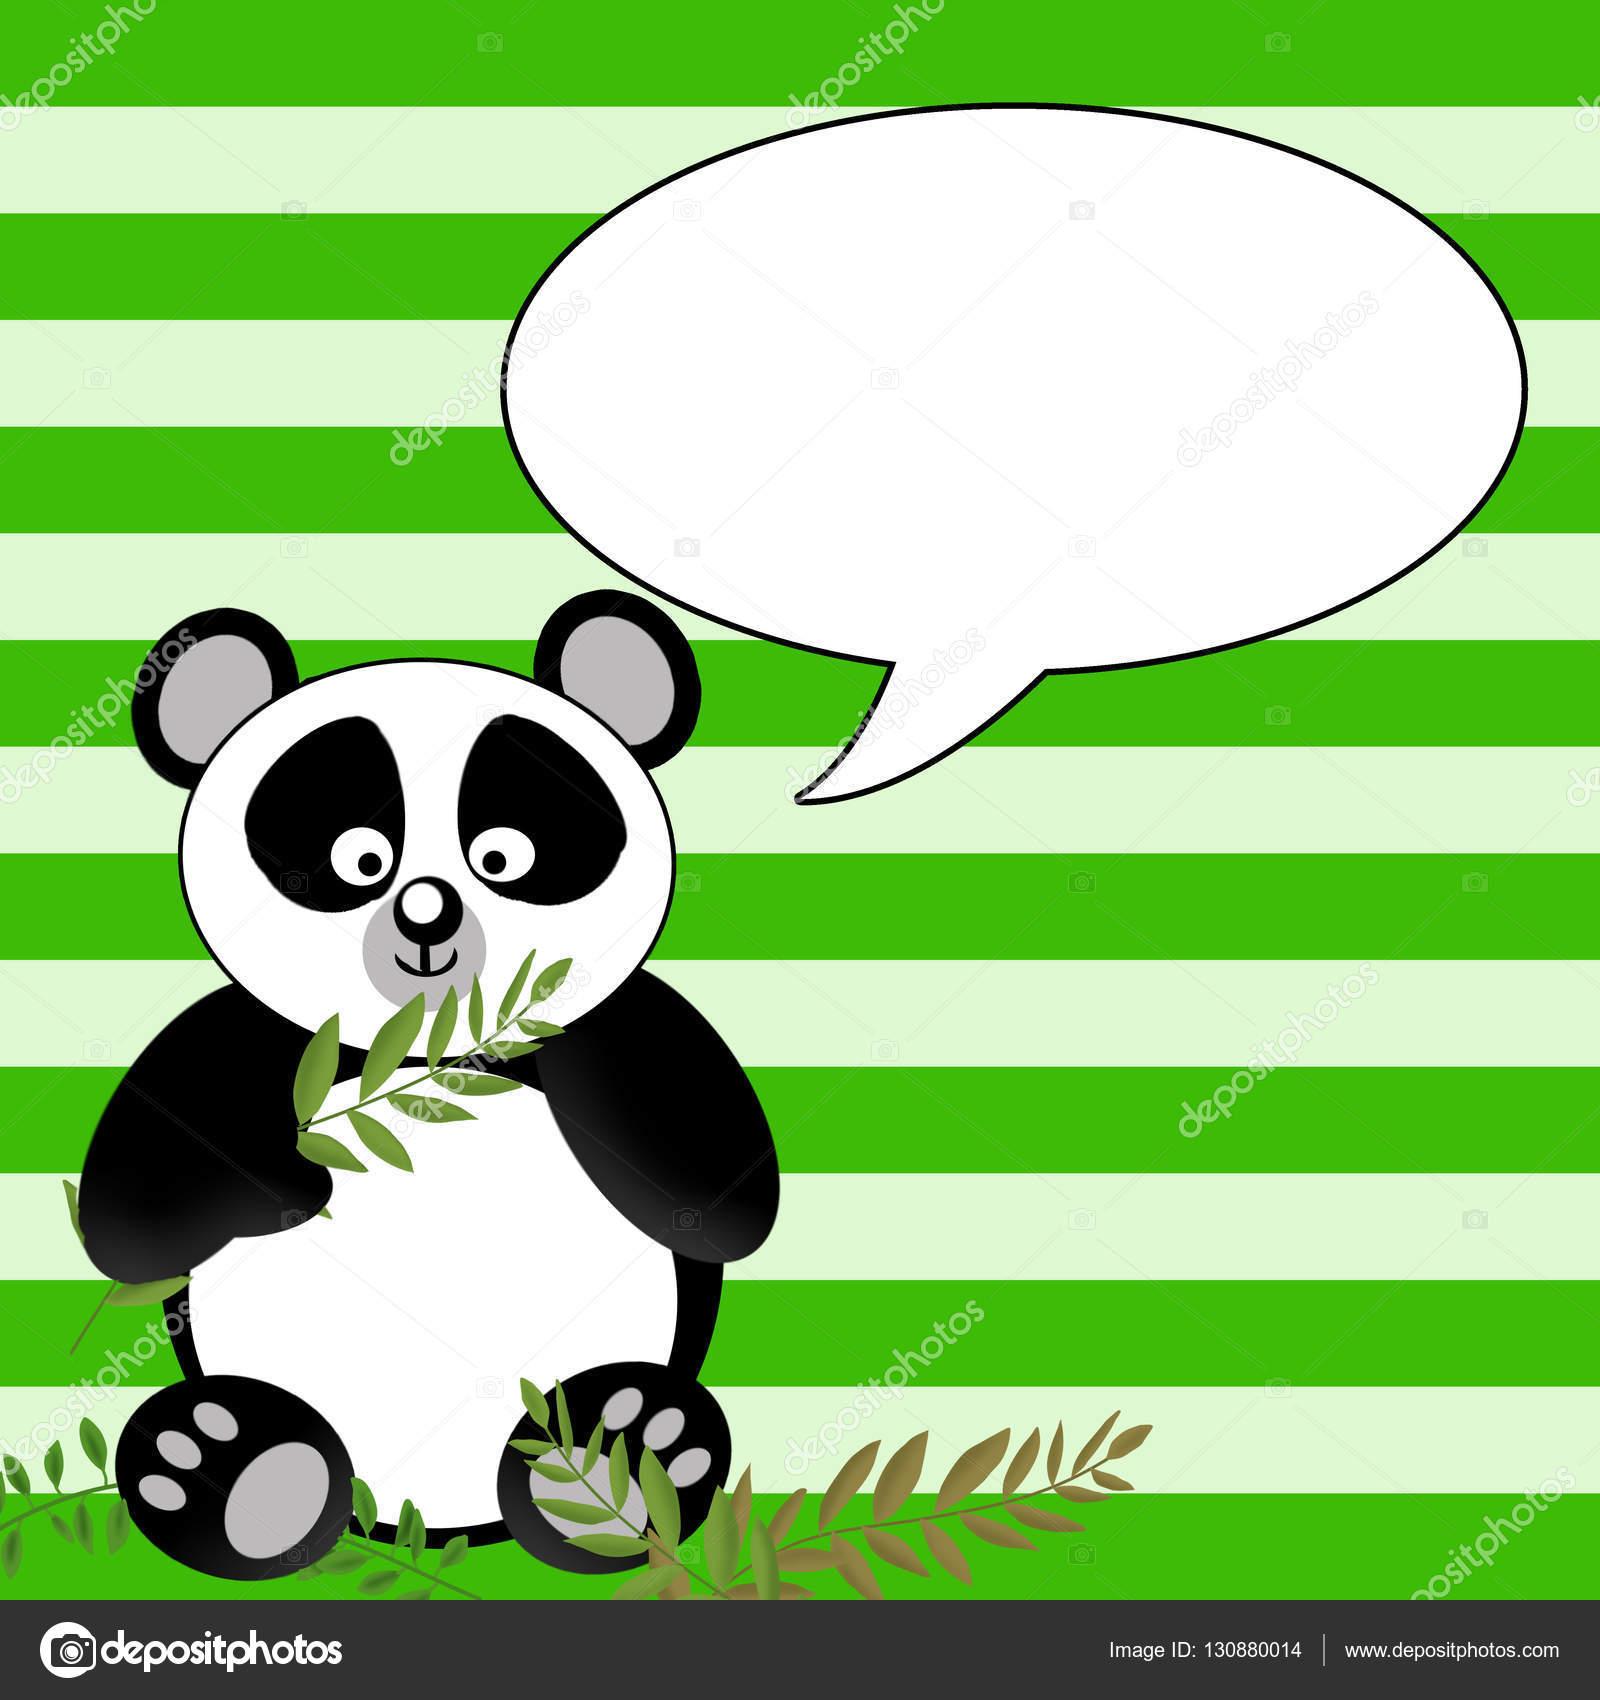 e04e834b7444 Fun Panda Bear Graphic Illustration - talk bubble — Stock Photo ...